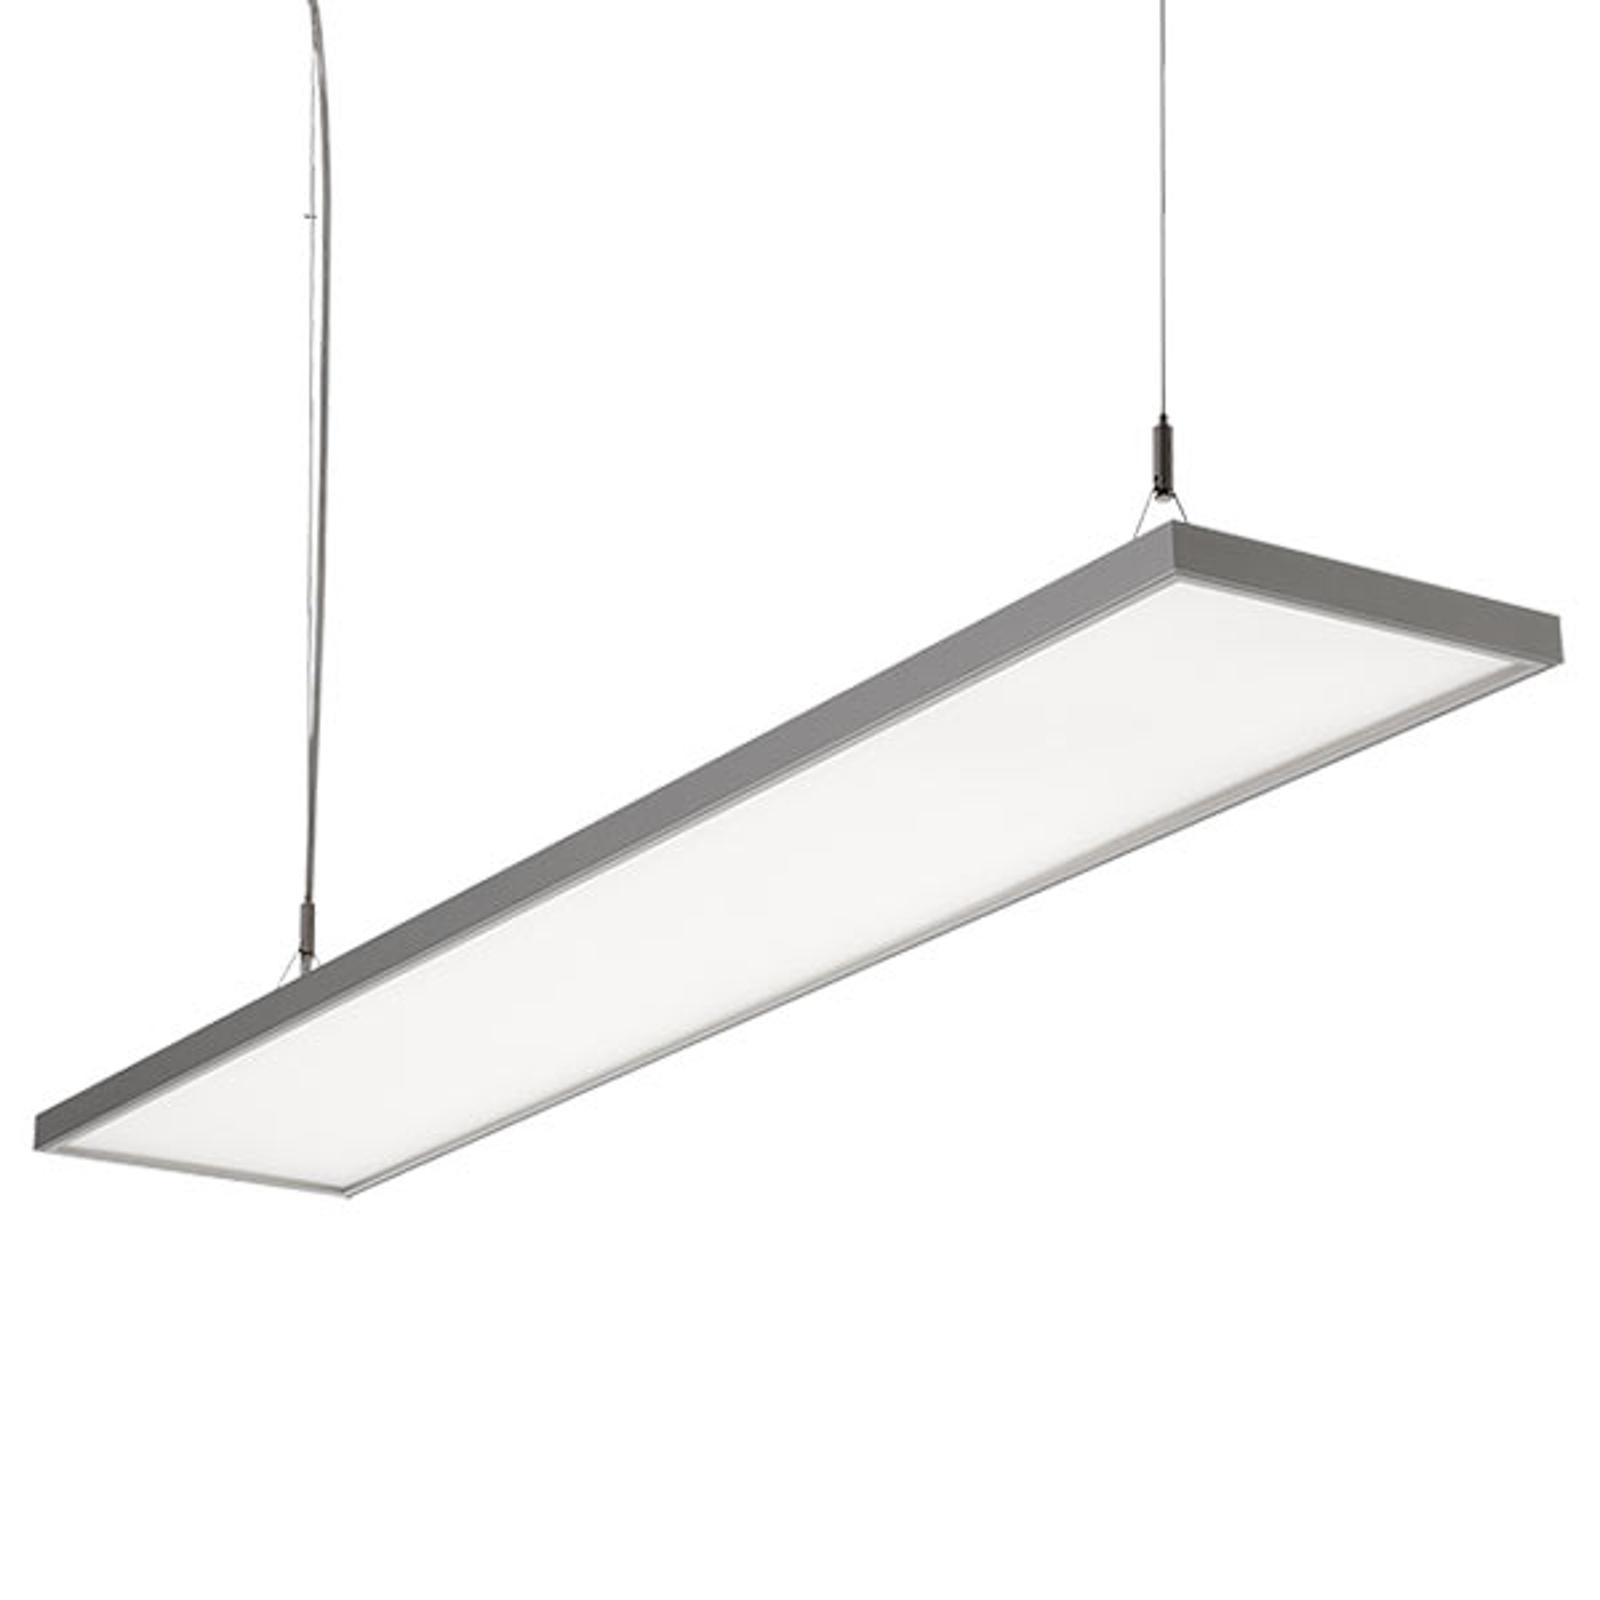 Lampa wisząca C95-P 4000 HF PRE C2, mikropryzmat